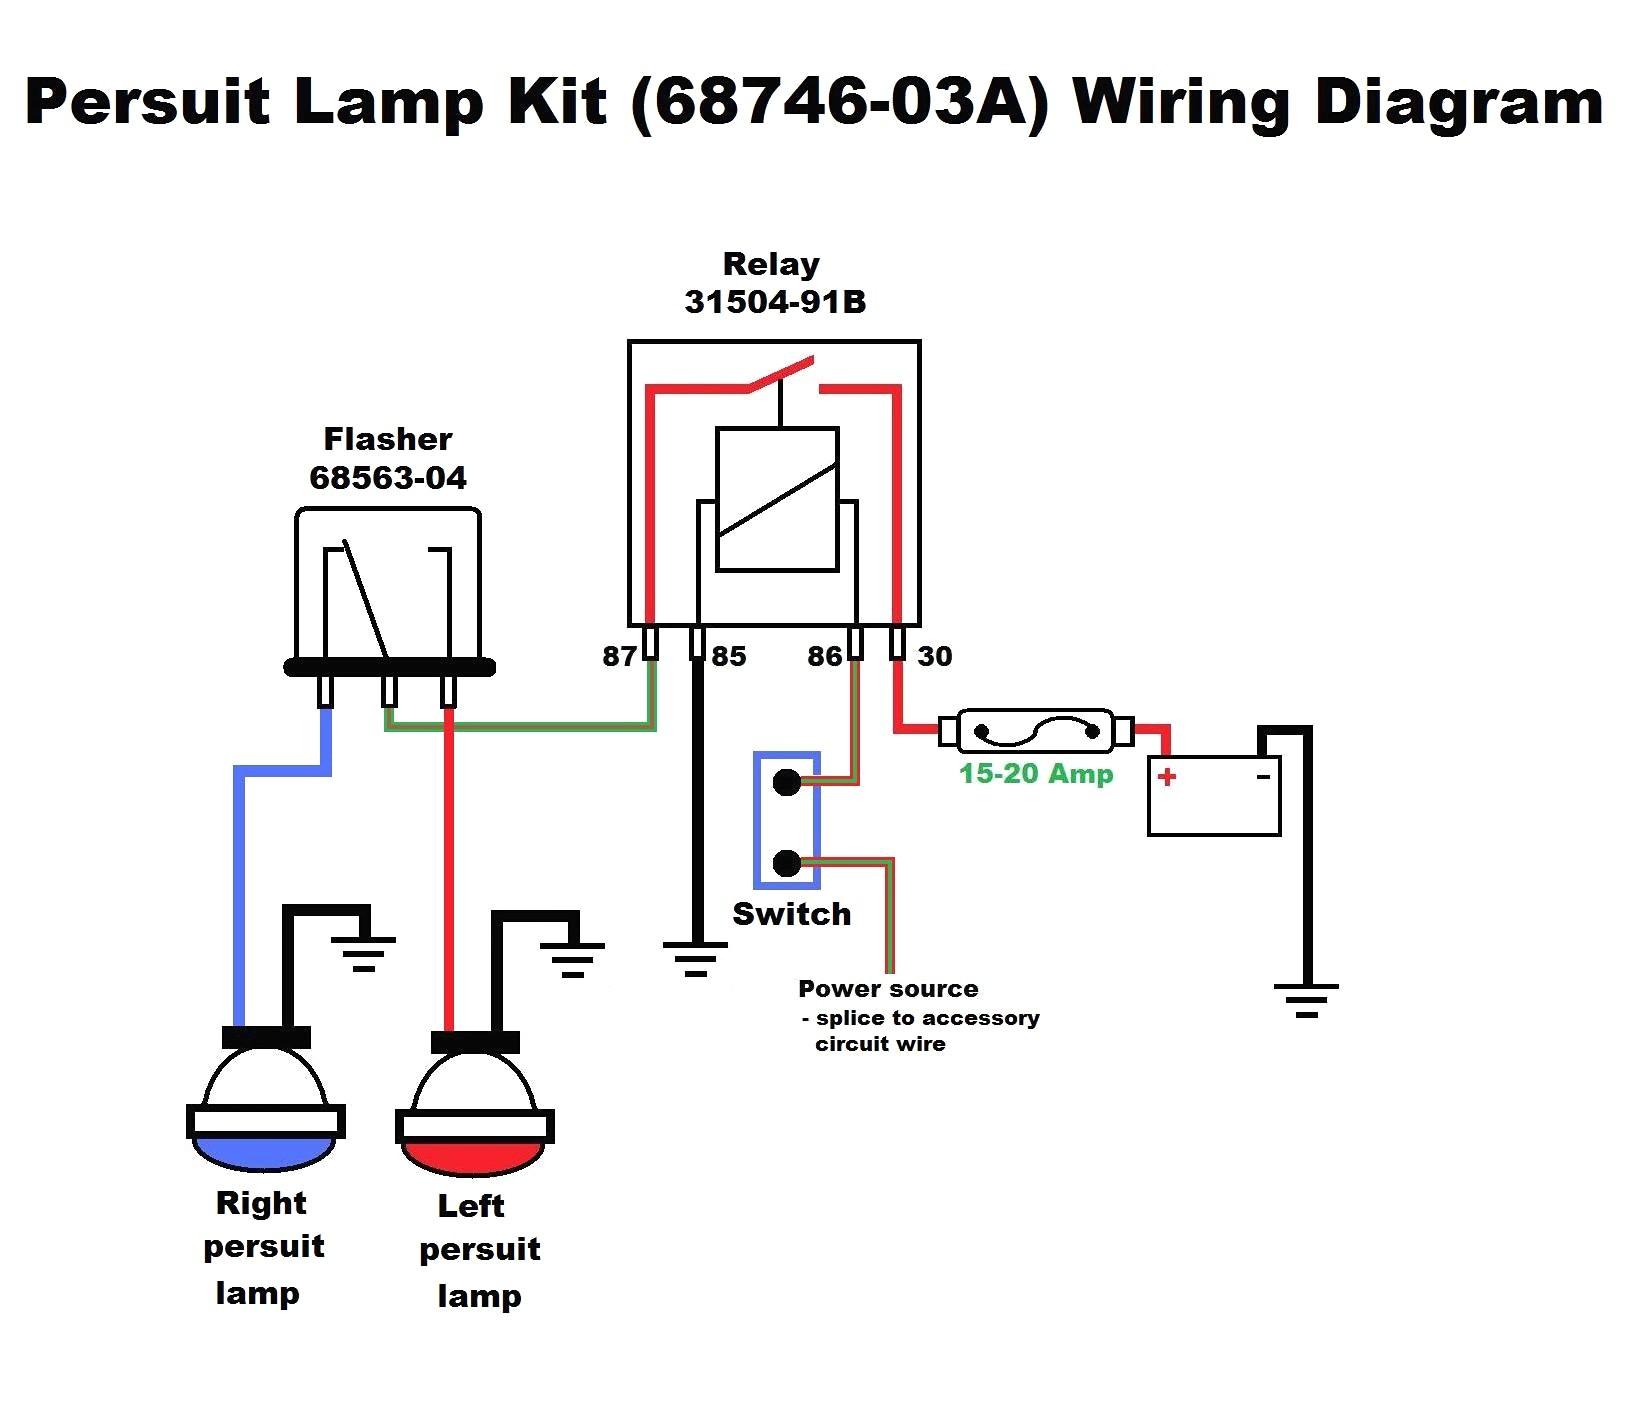 Utv Turn Signal Wiring Diagram from static-cdn.imageservice.cloud